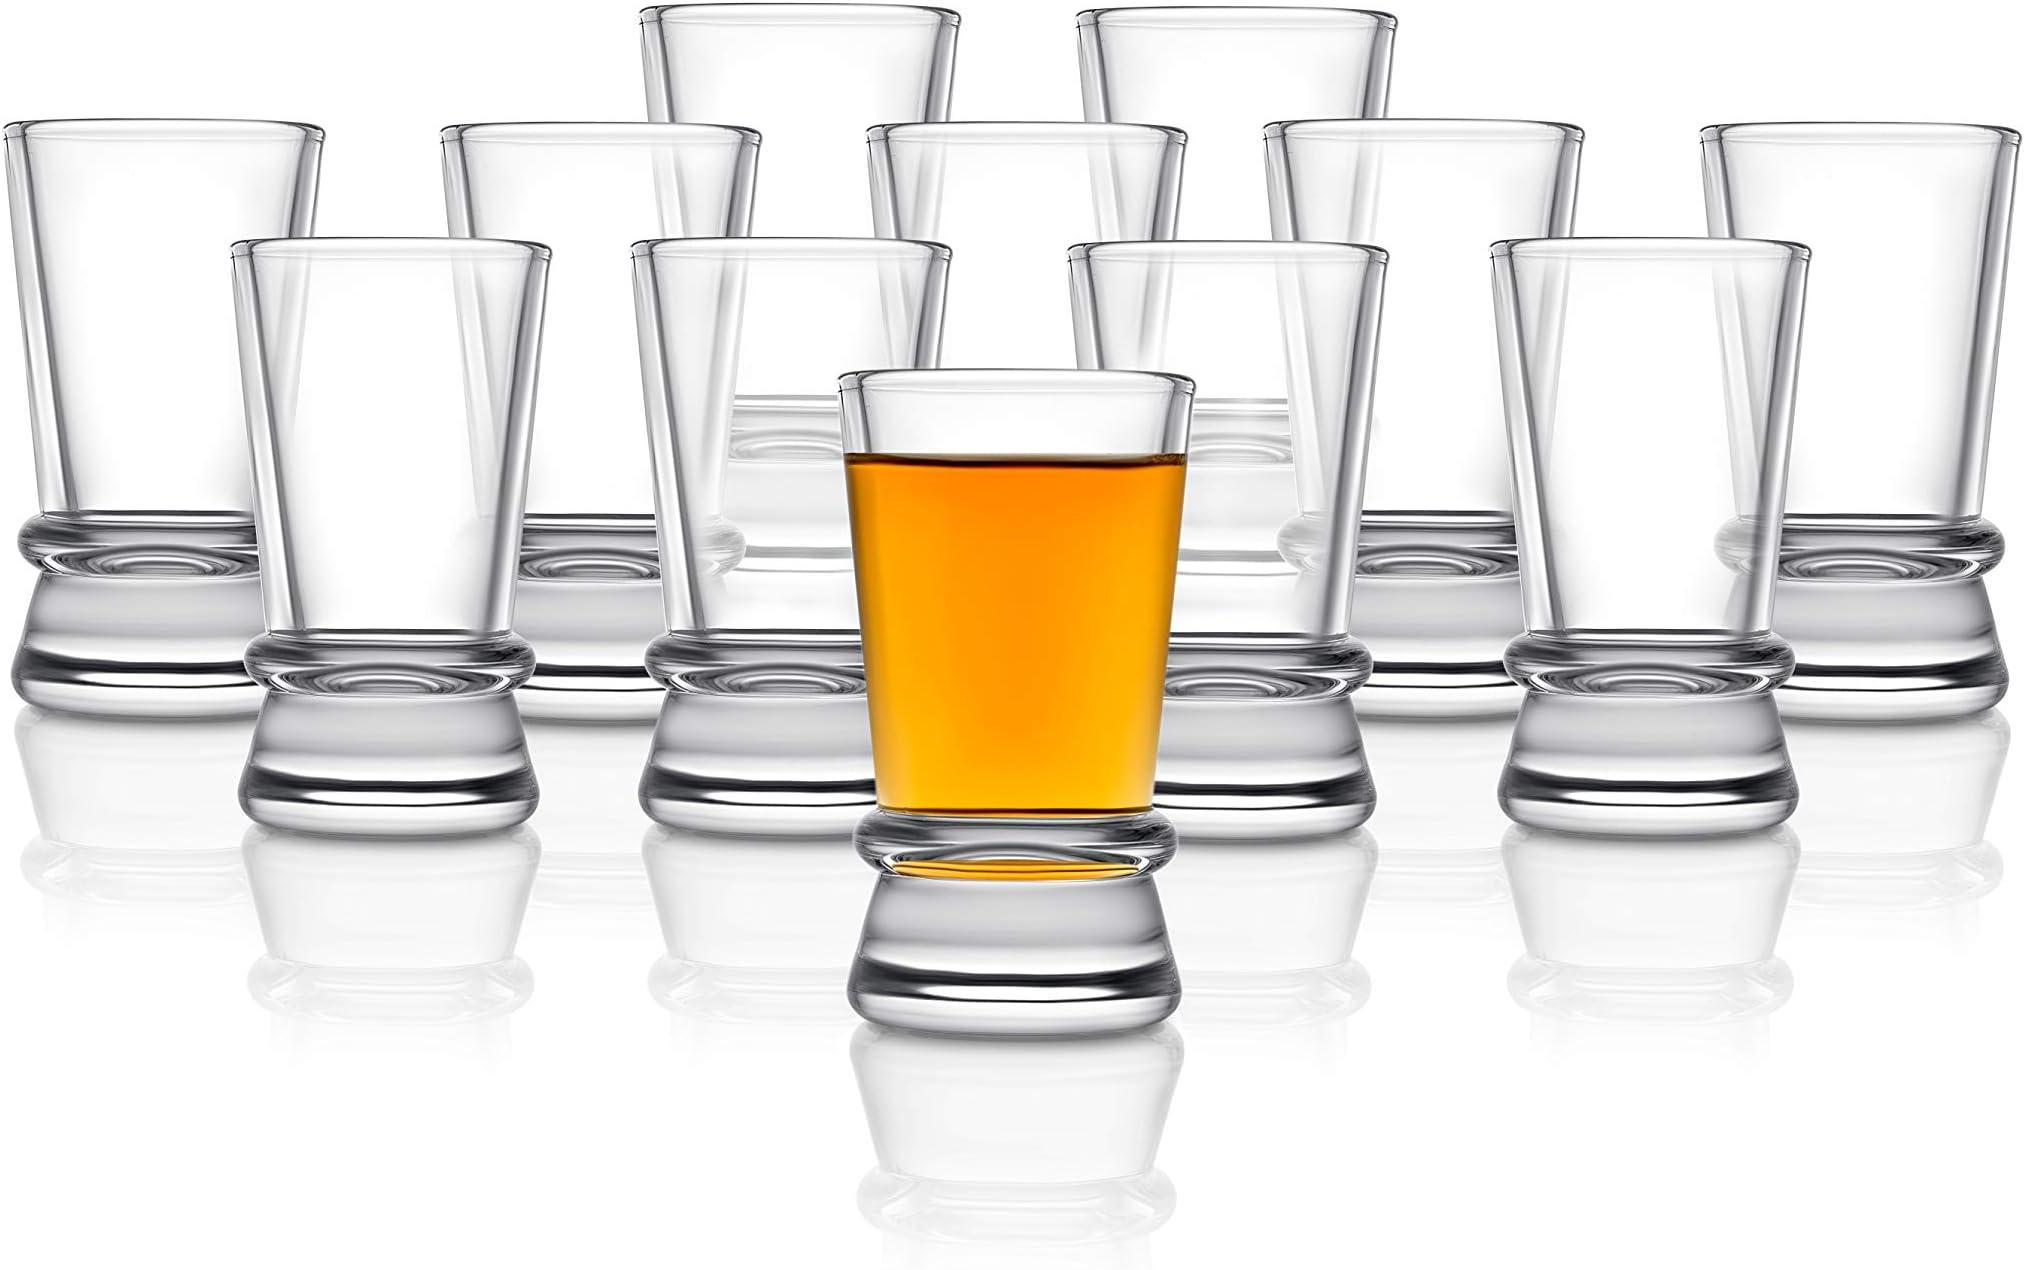 JoyJolt Afina Heavy Base Shot Glasses (Pack of 12) - 1.5-Ounces